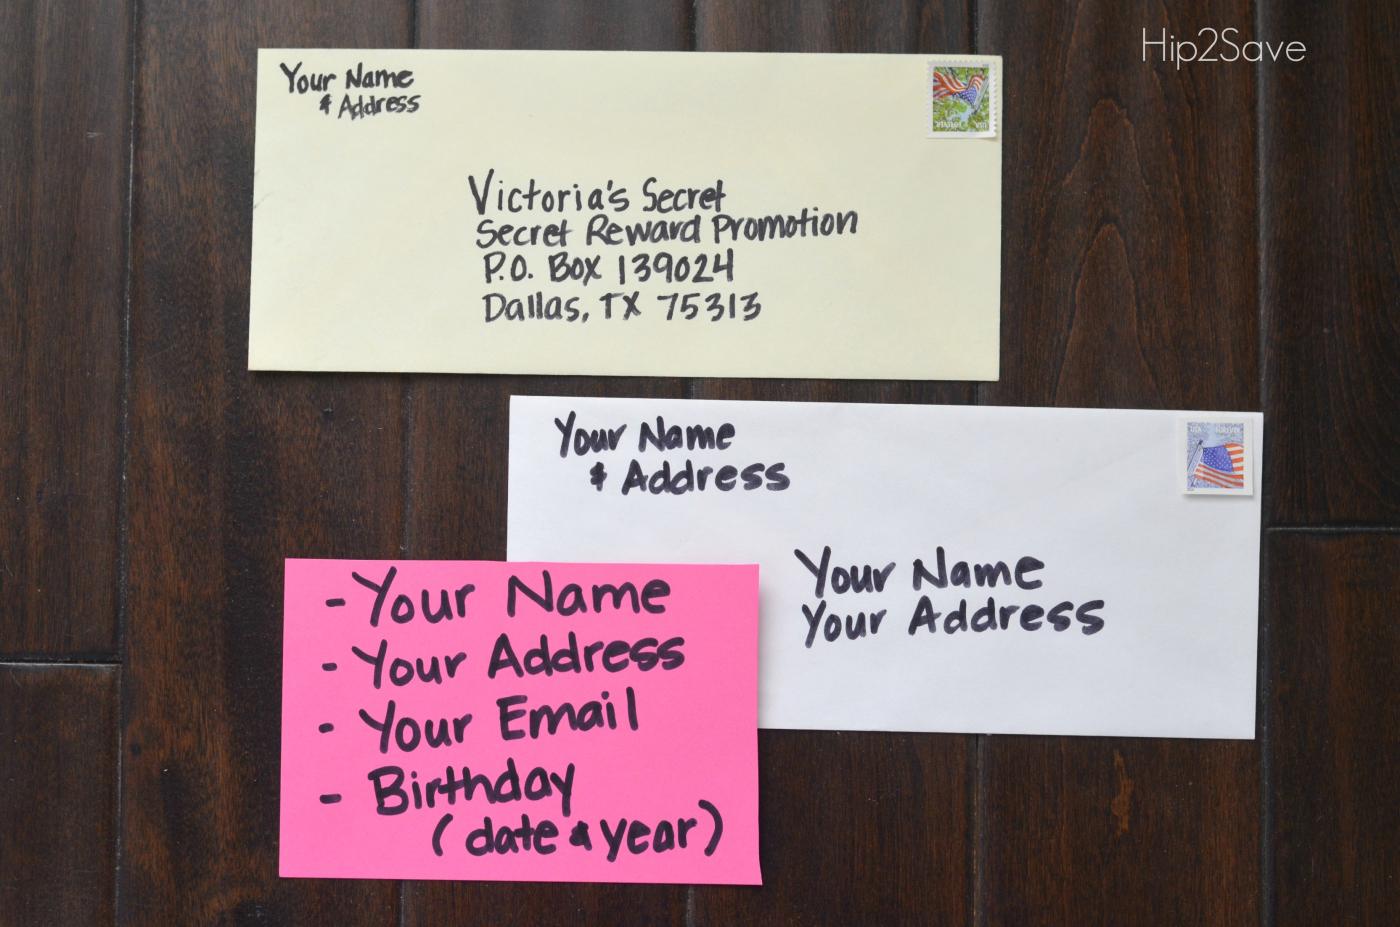 Hip2Save decade of favorite freebies and deals – Victoria's secret revised-envelopes